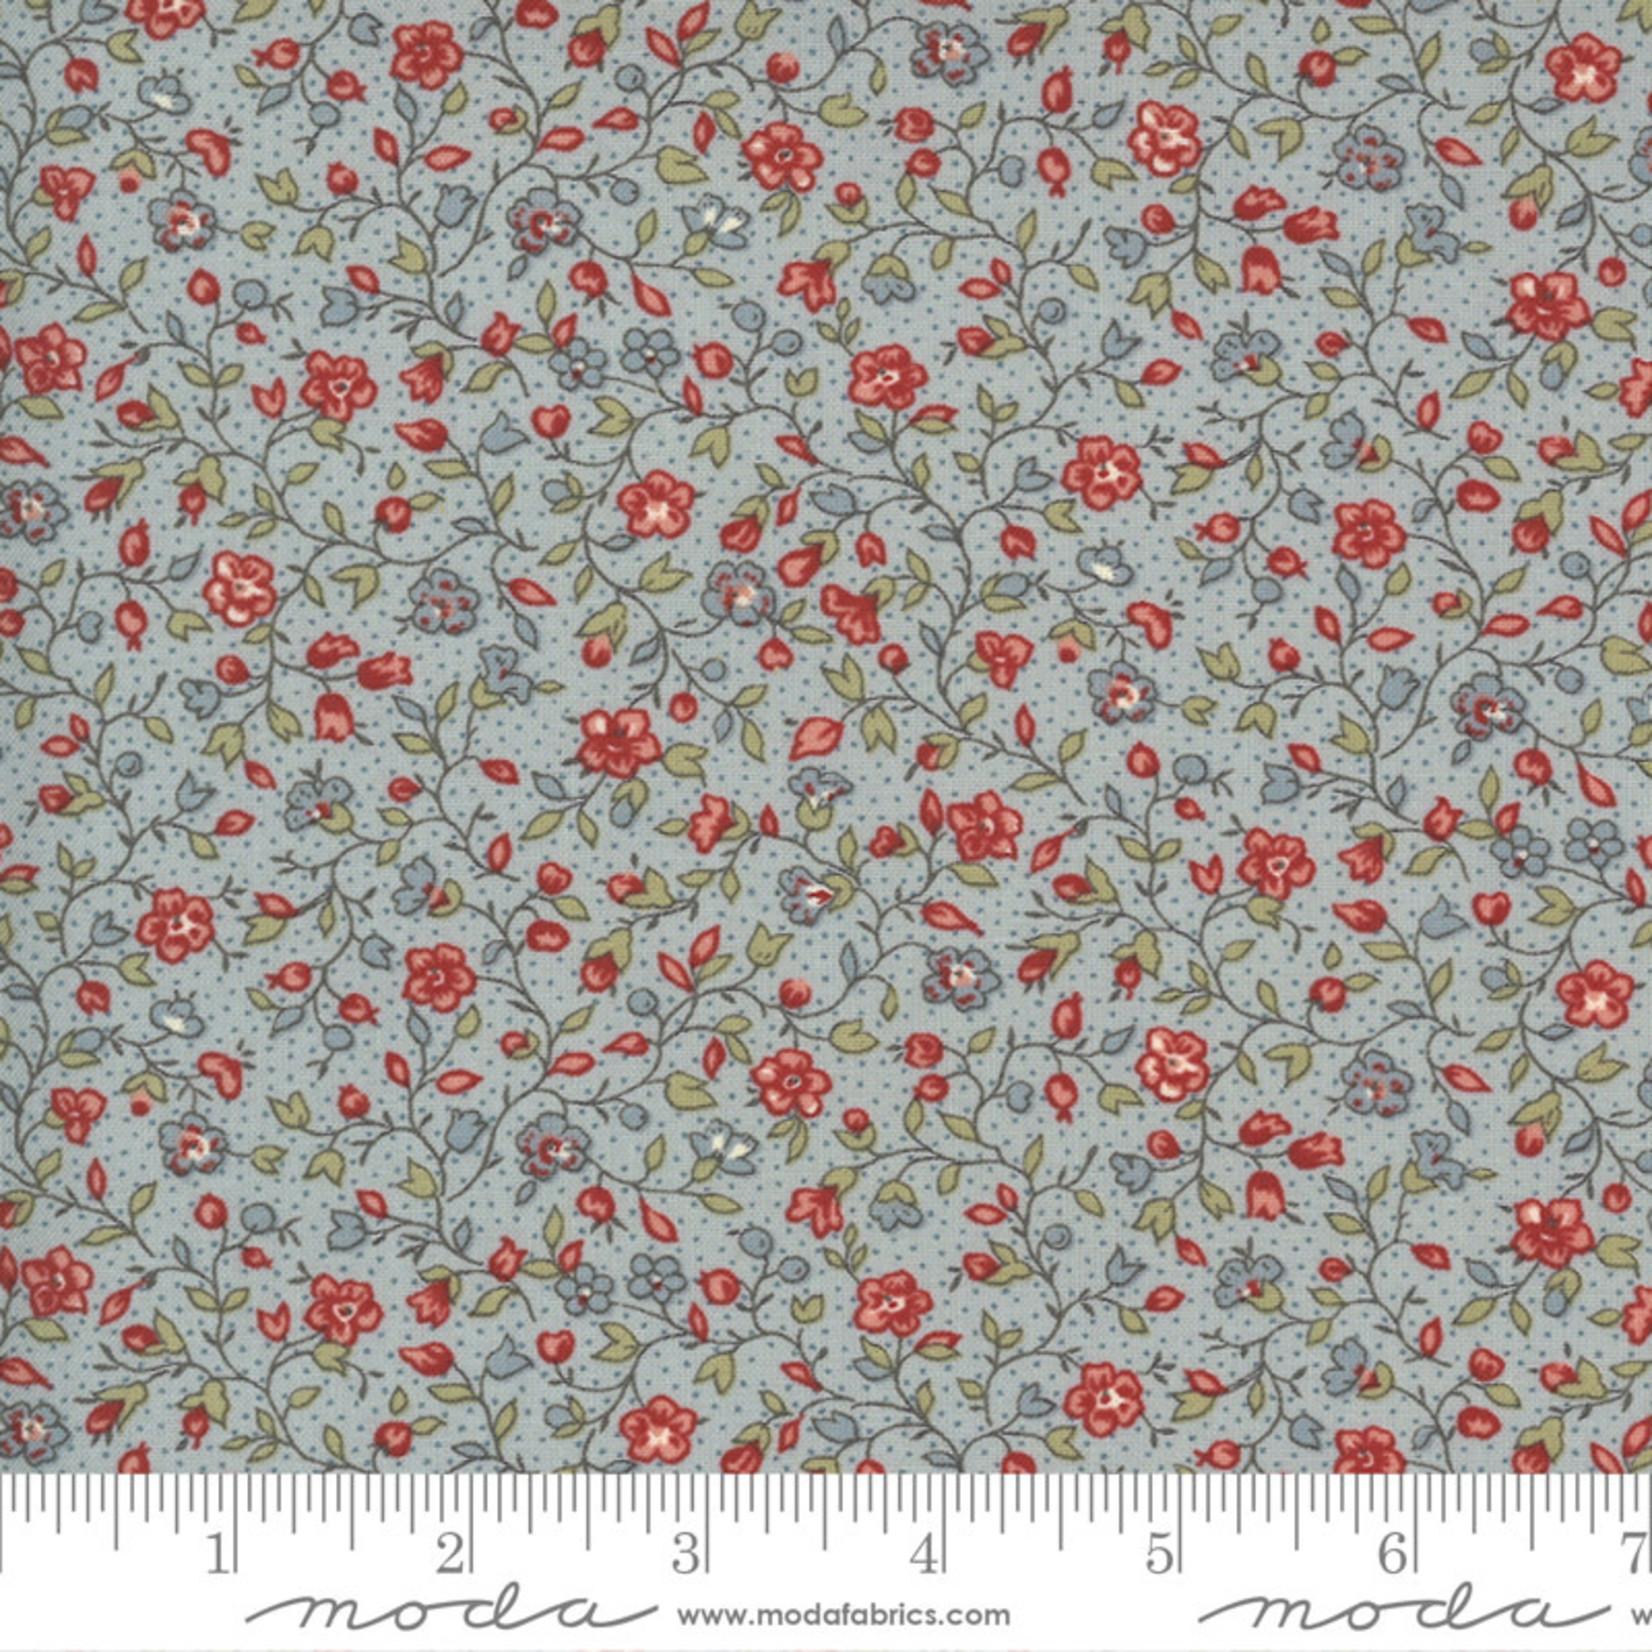 FRENCH GENERAL Jardins De Fleurs, Villandry, Ciel Blue 13895-16 $0.20 per cm or $20/m